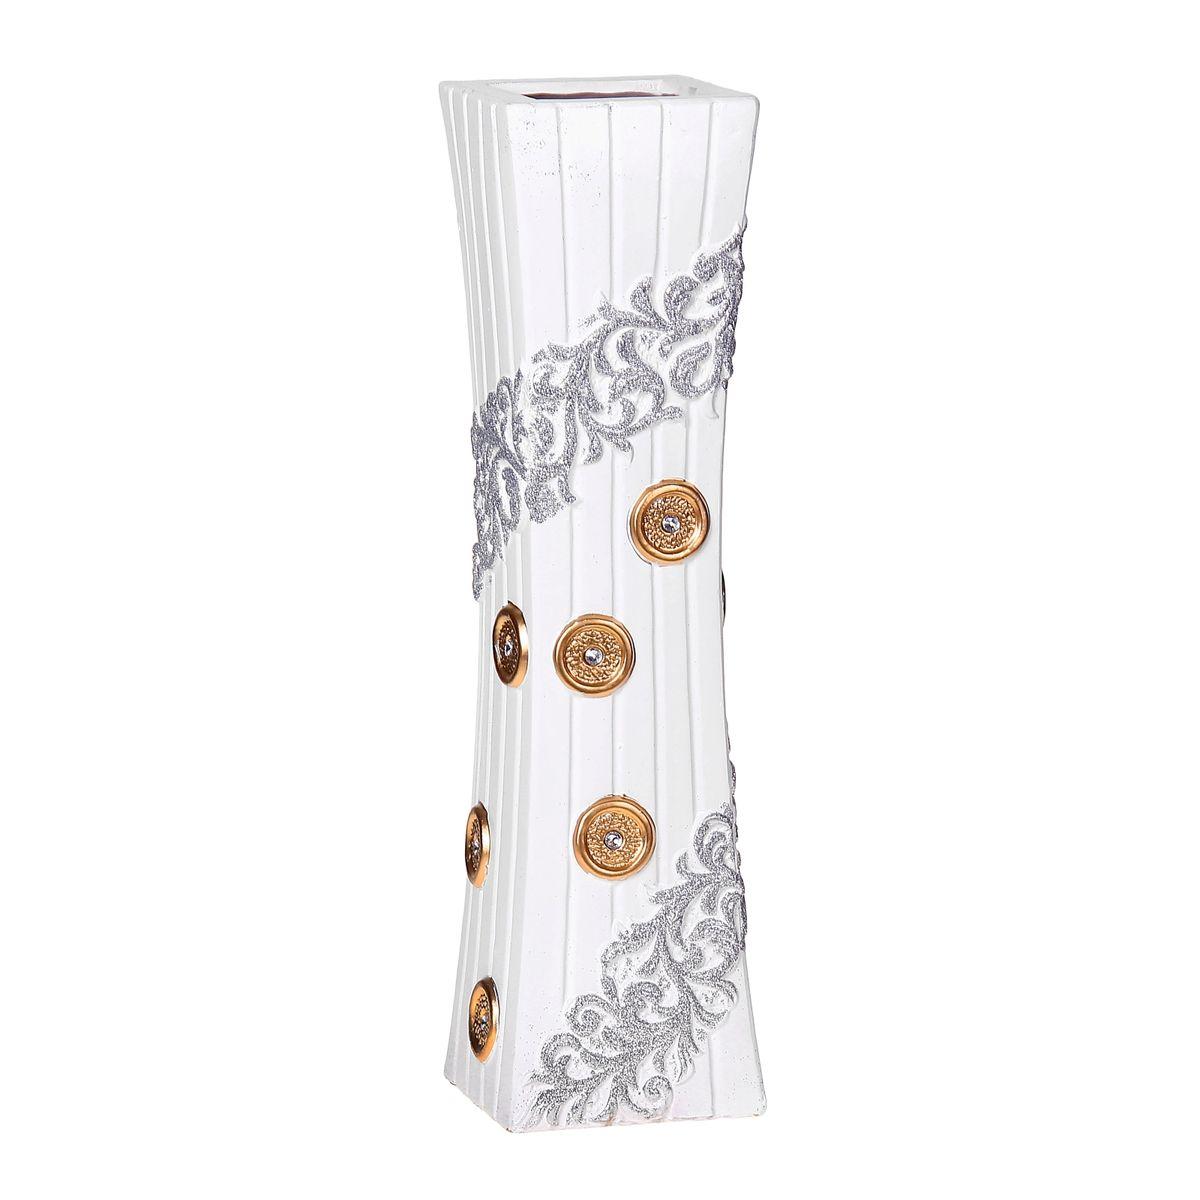 Ваза напольная Sima-land Пуговица, высота 60 см ваза sima land серебряная роза высота 18 см